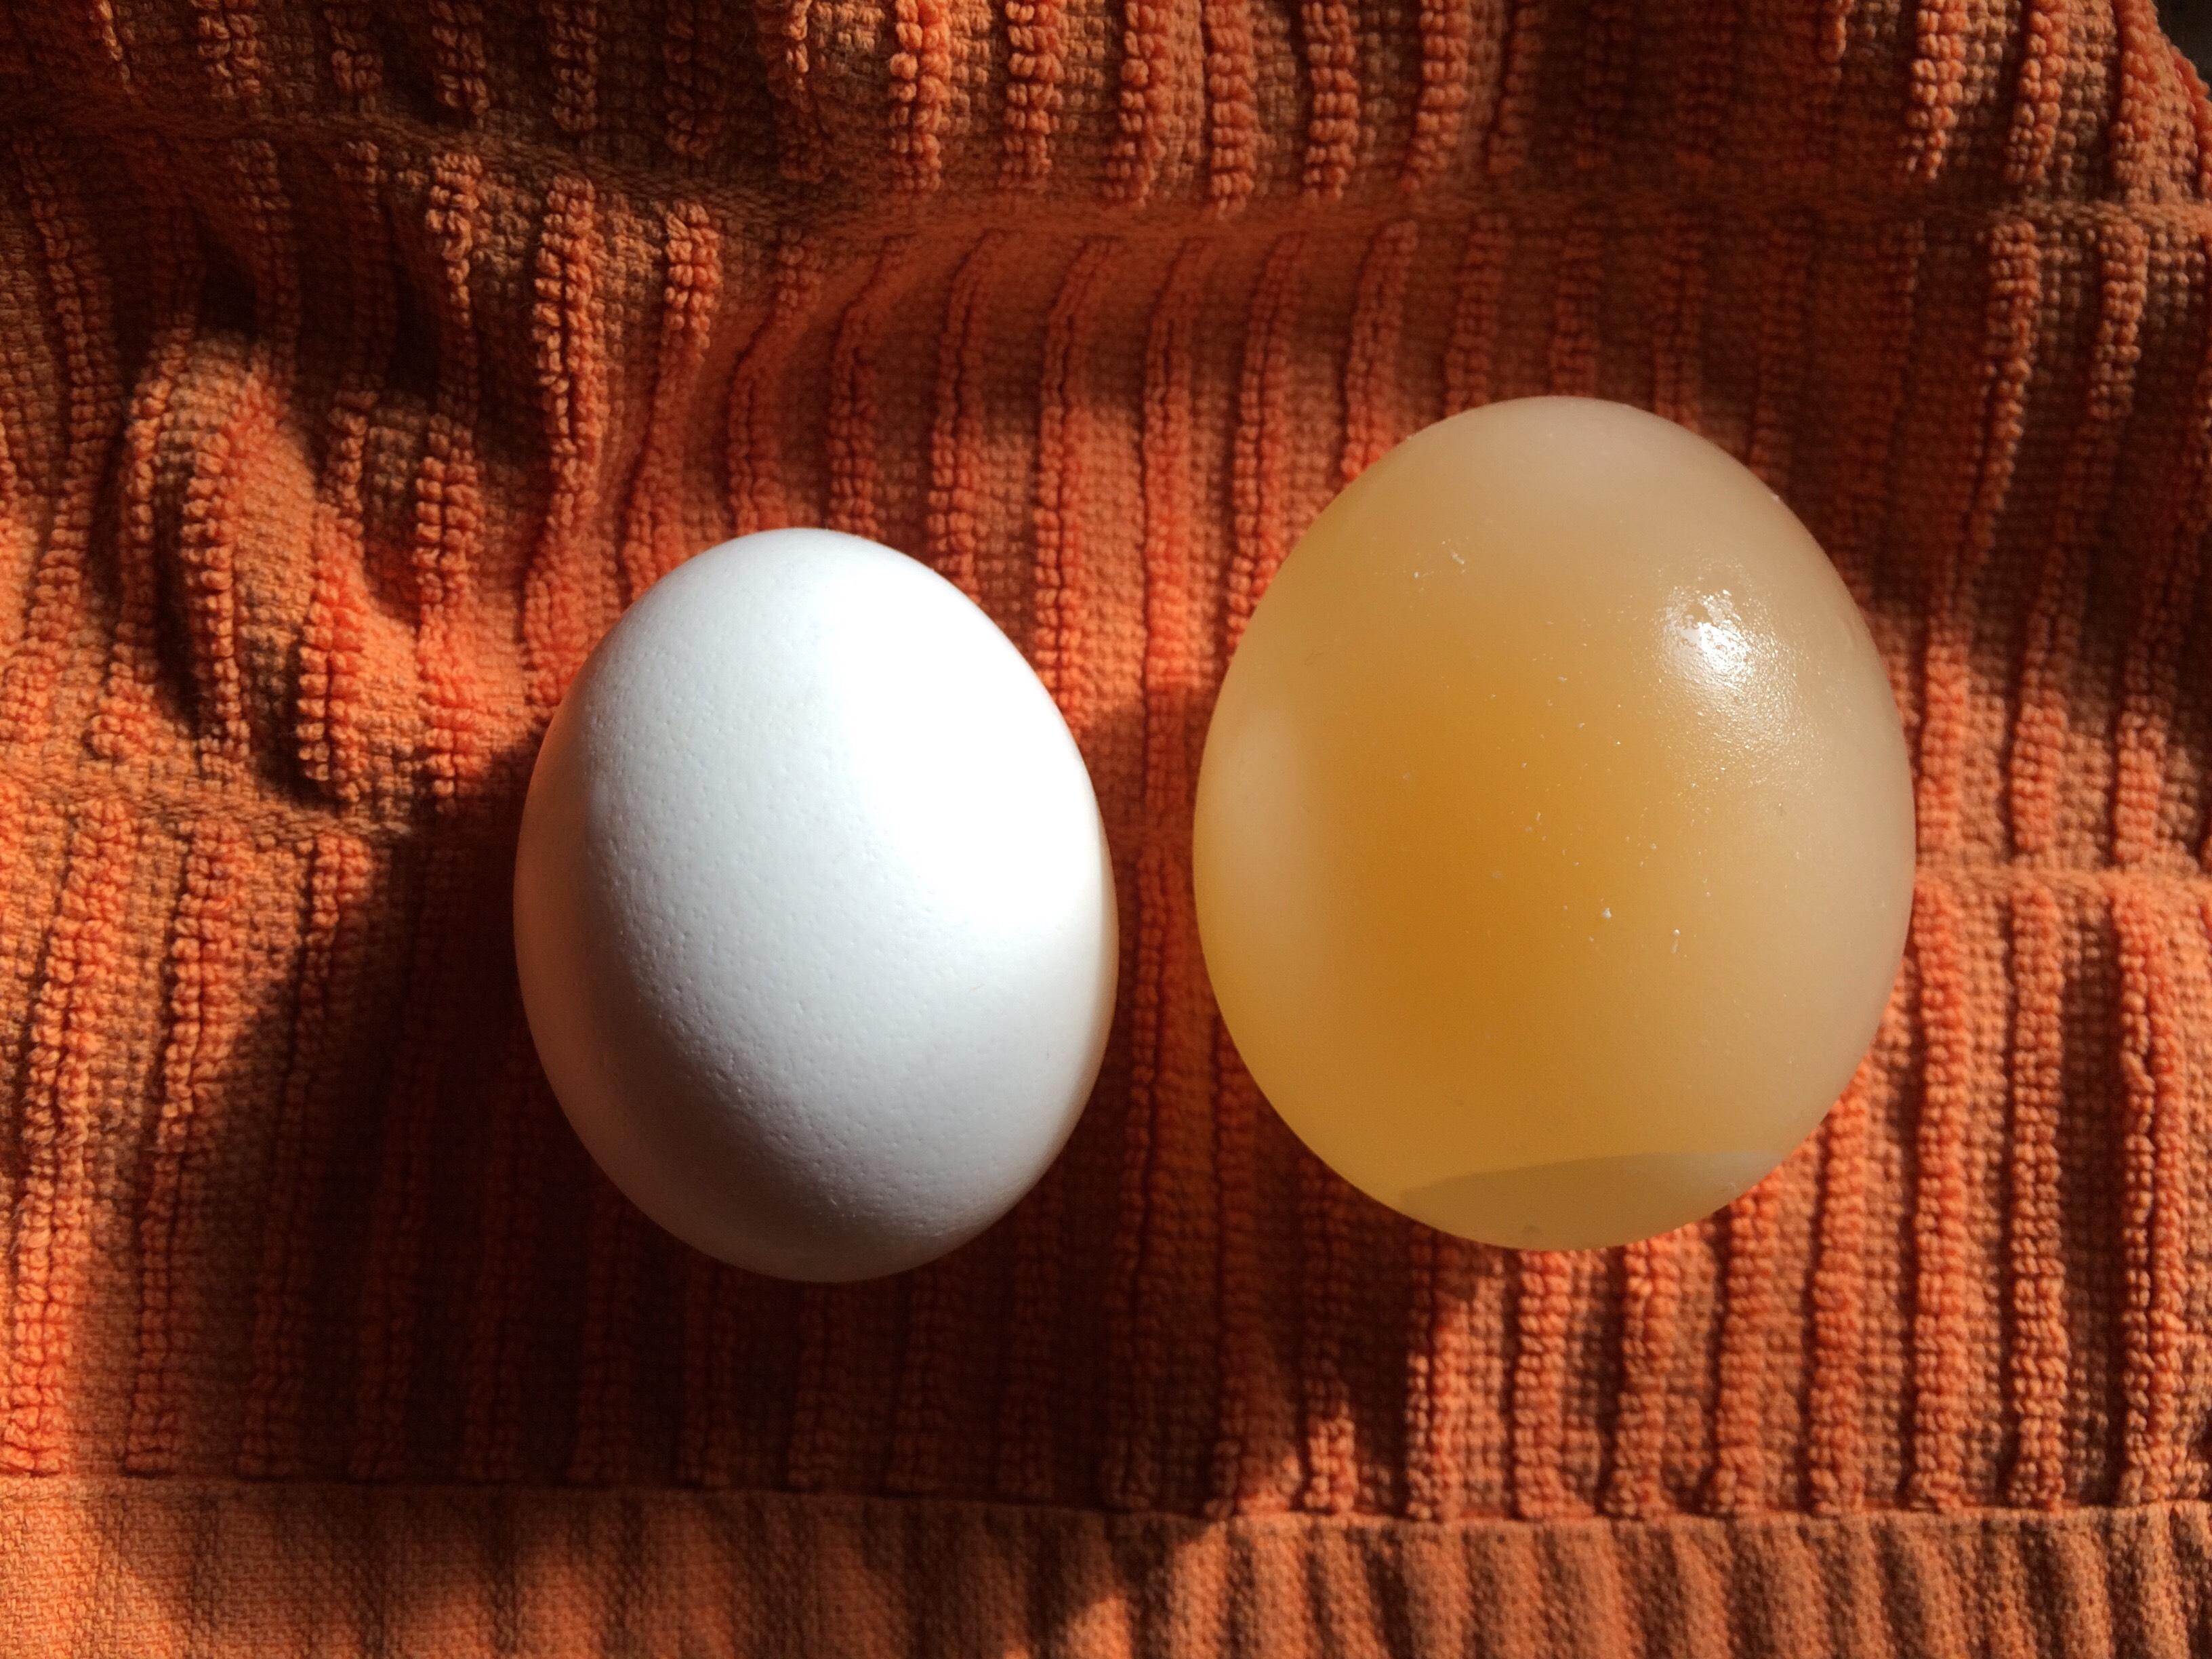 How To Grow an Egg Using Osmosis